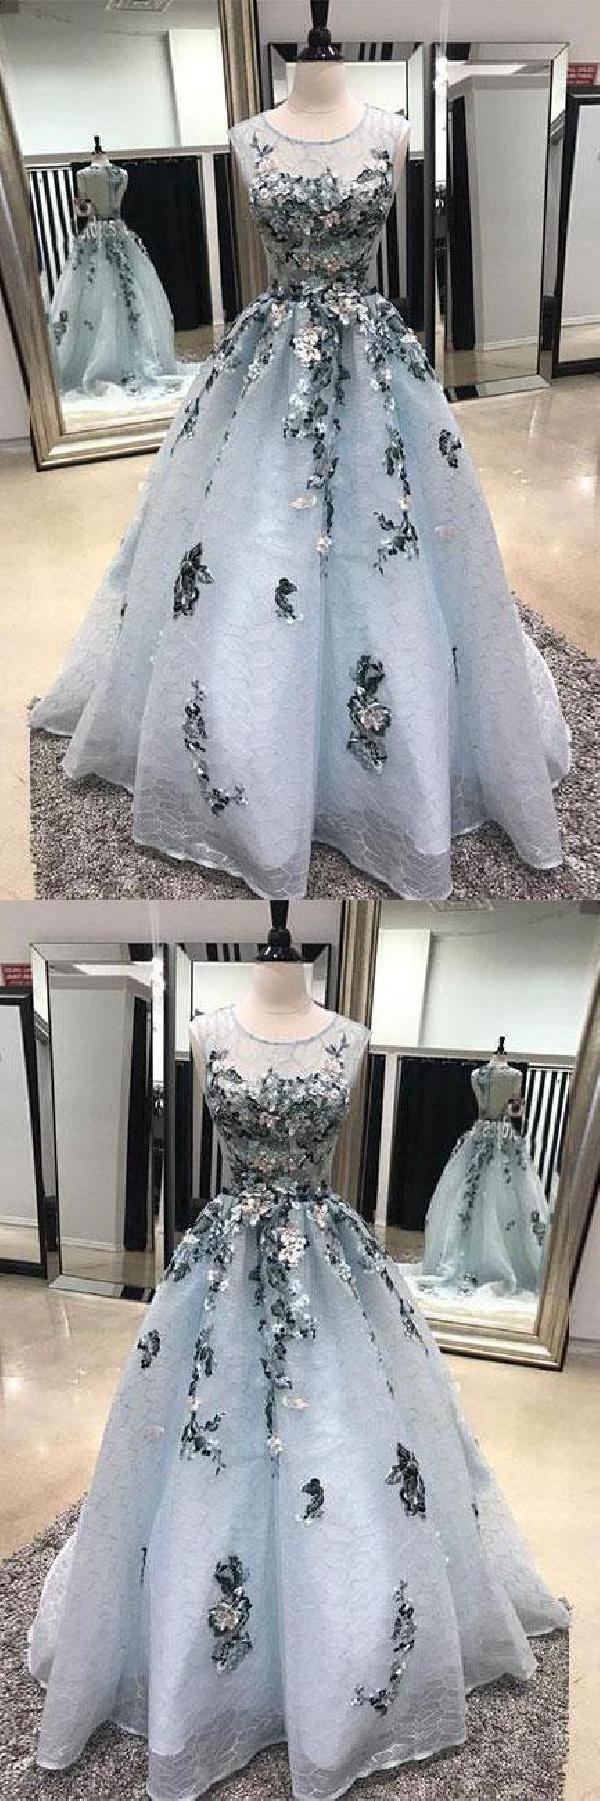 Prom dress long prom dress lace aline prom dress prom dress with